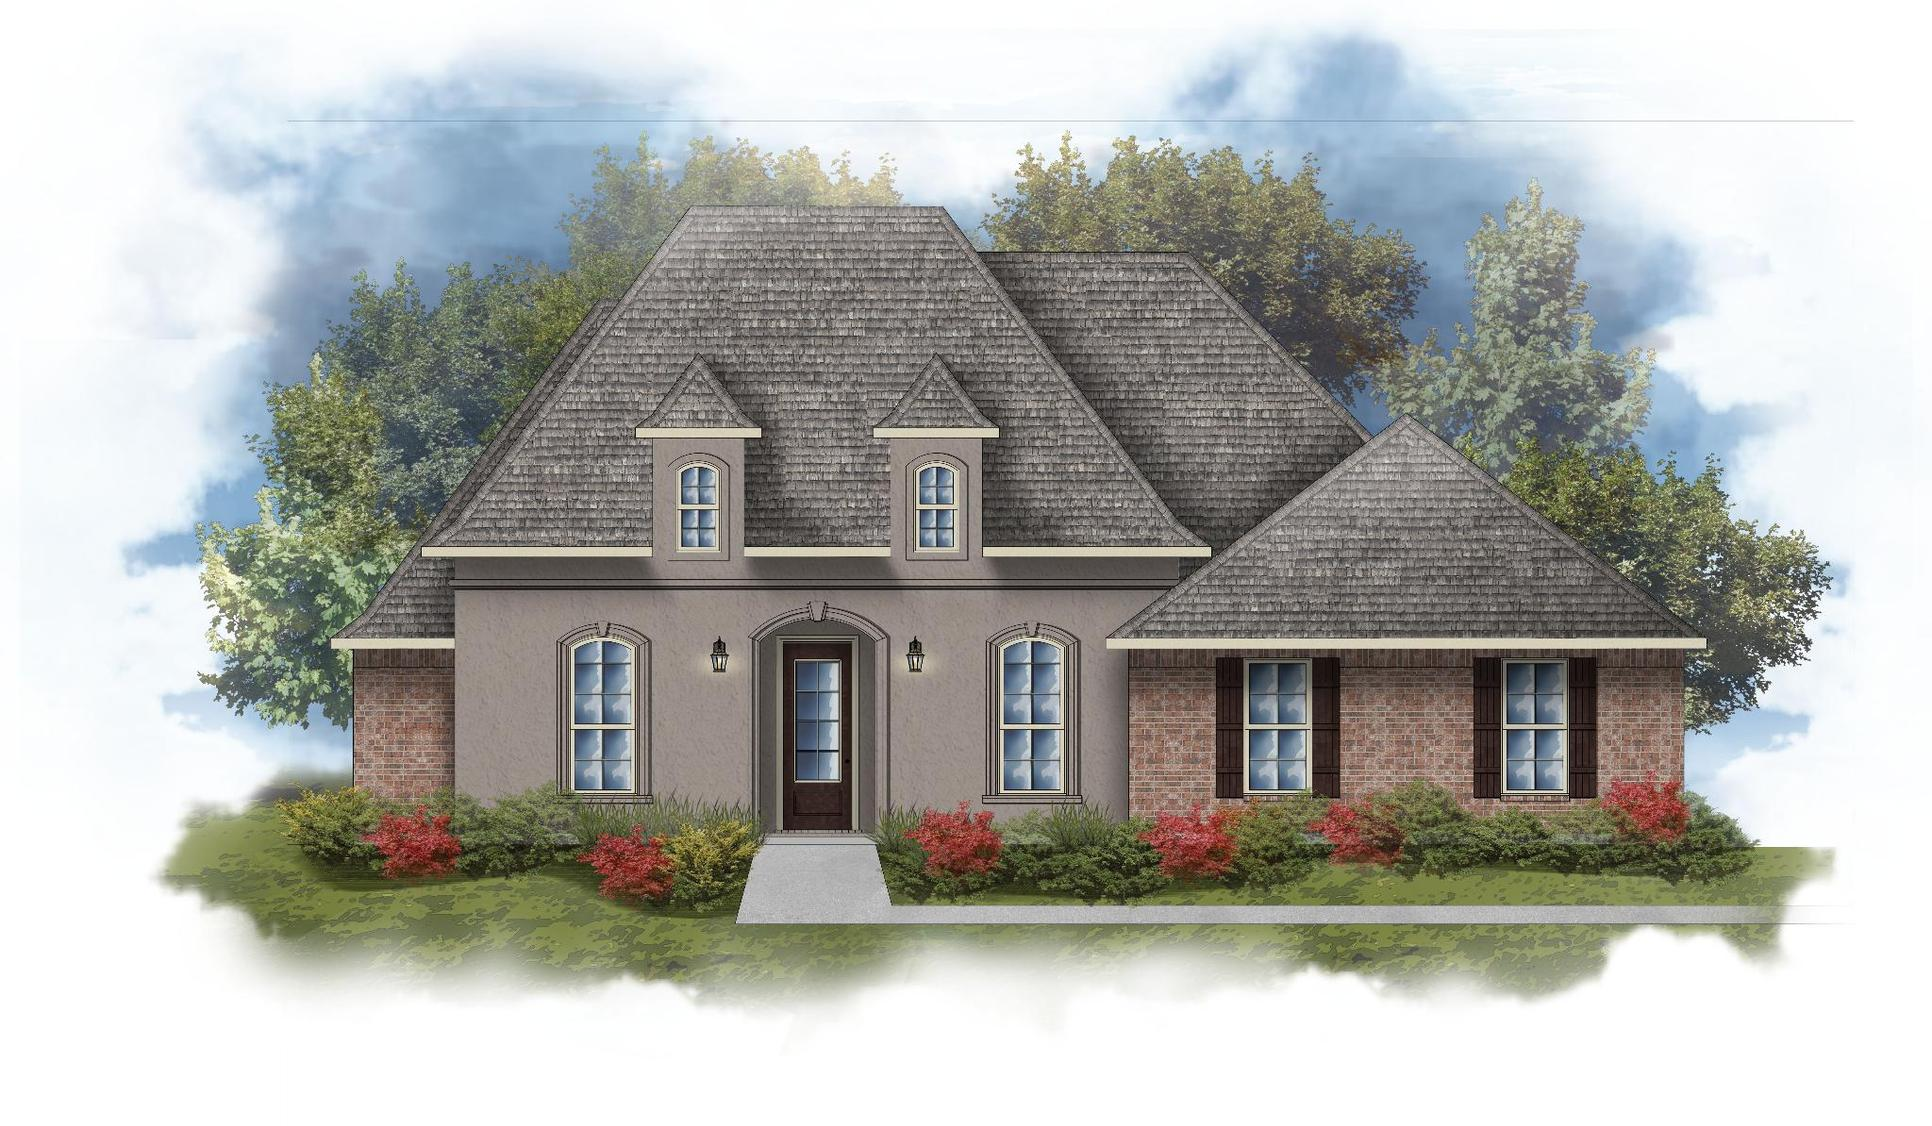 Rossi III A Open Floorplan Elevation Image - DSLD Homes